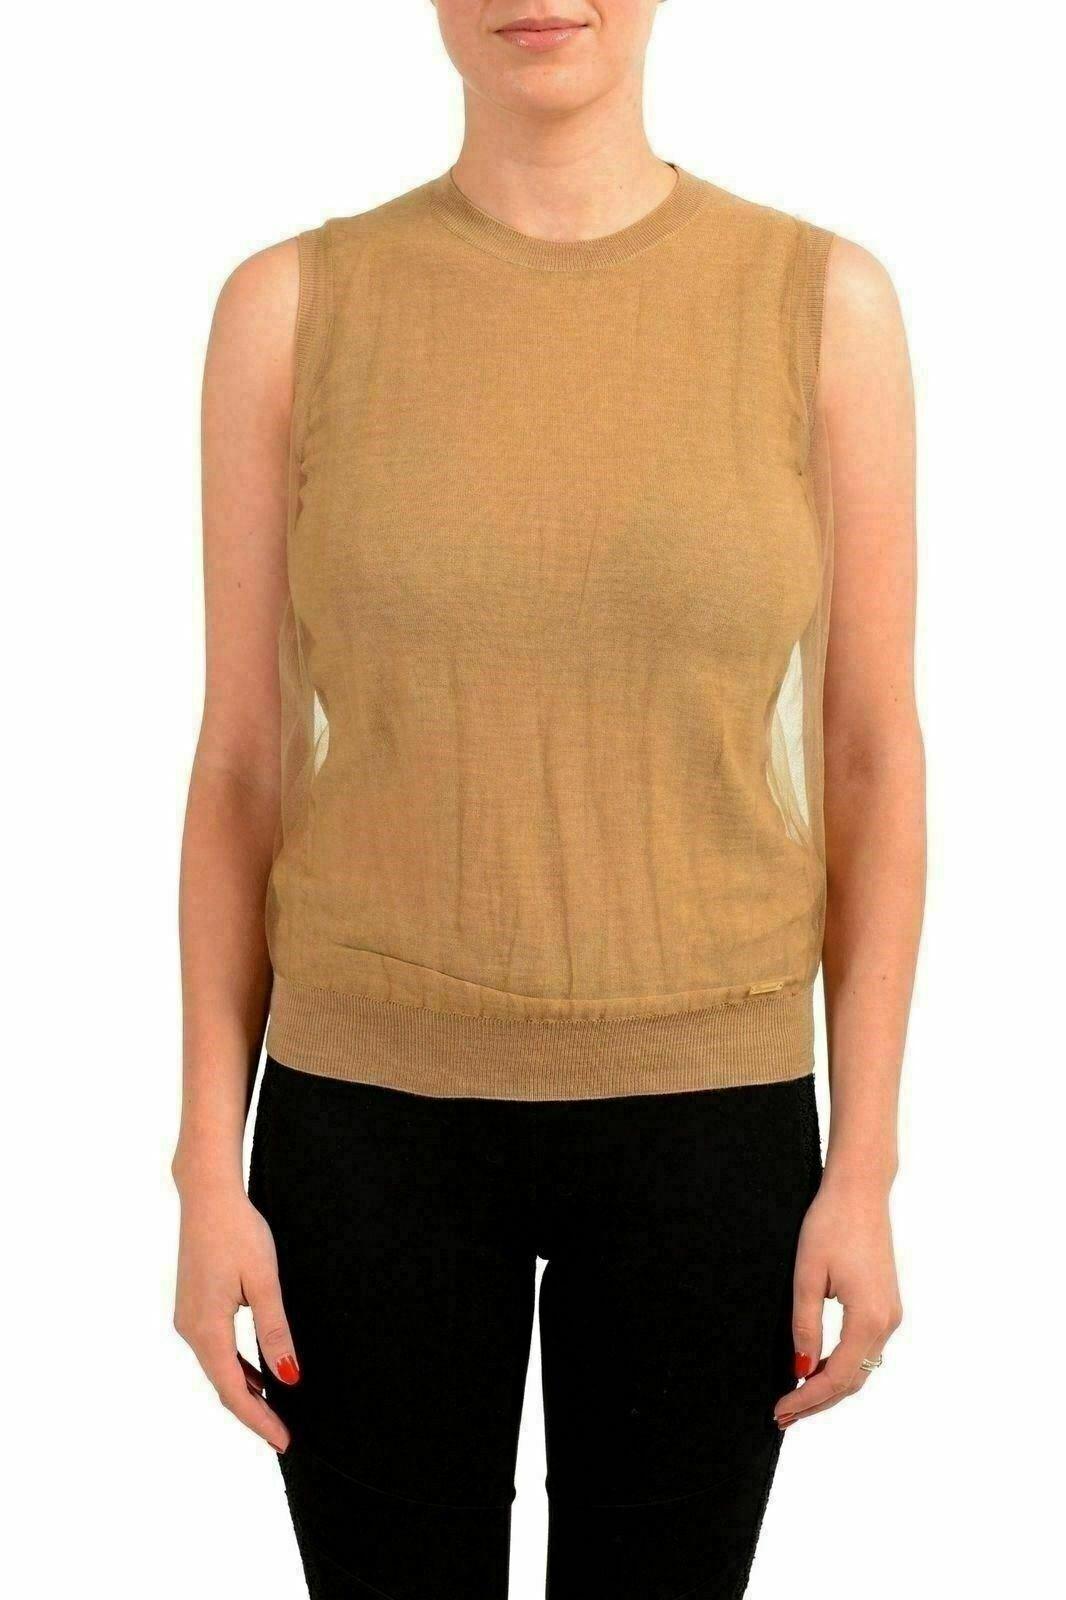 Dsquared2 Women's Wool Beige Sleeveless Knitted Top US XS IT 38